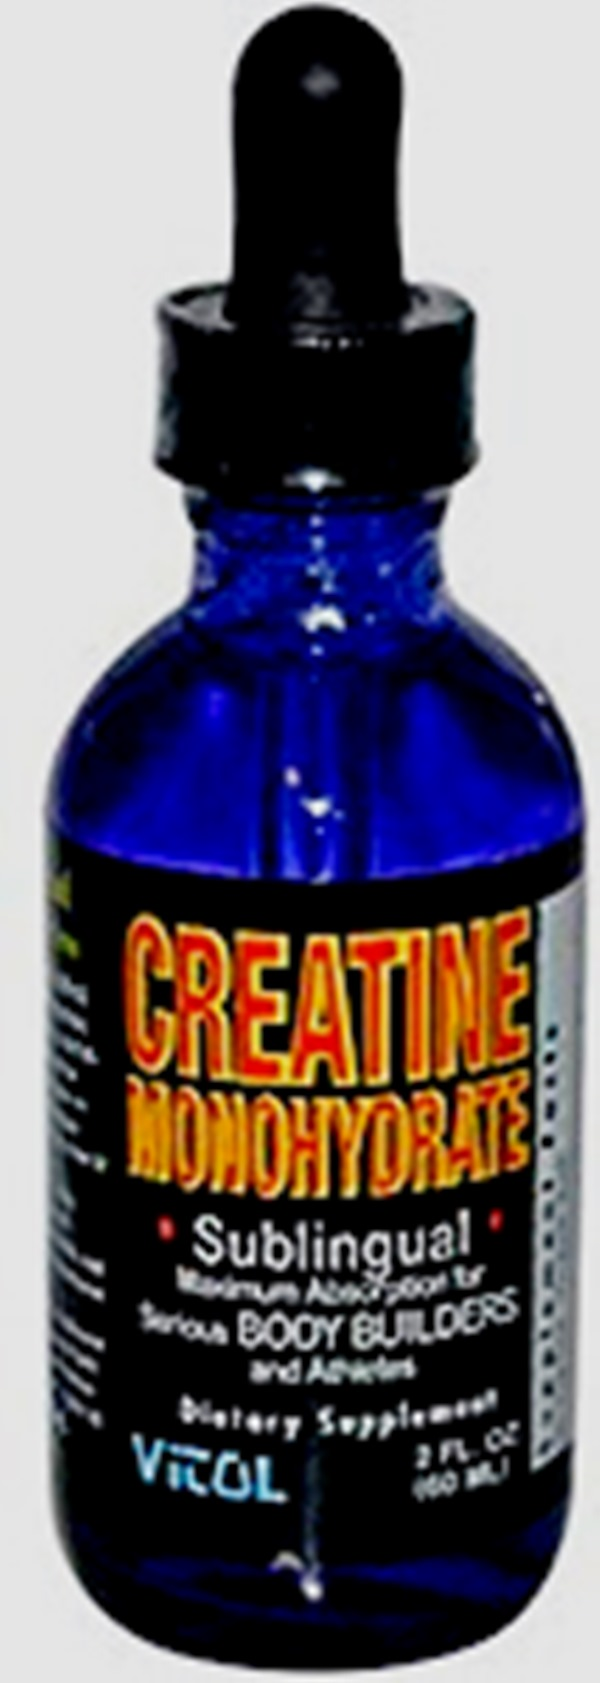 Vitol Creatine Monohydrate